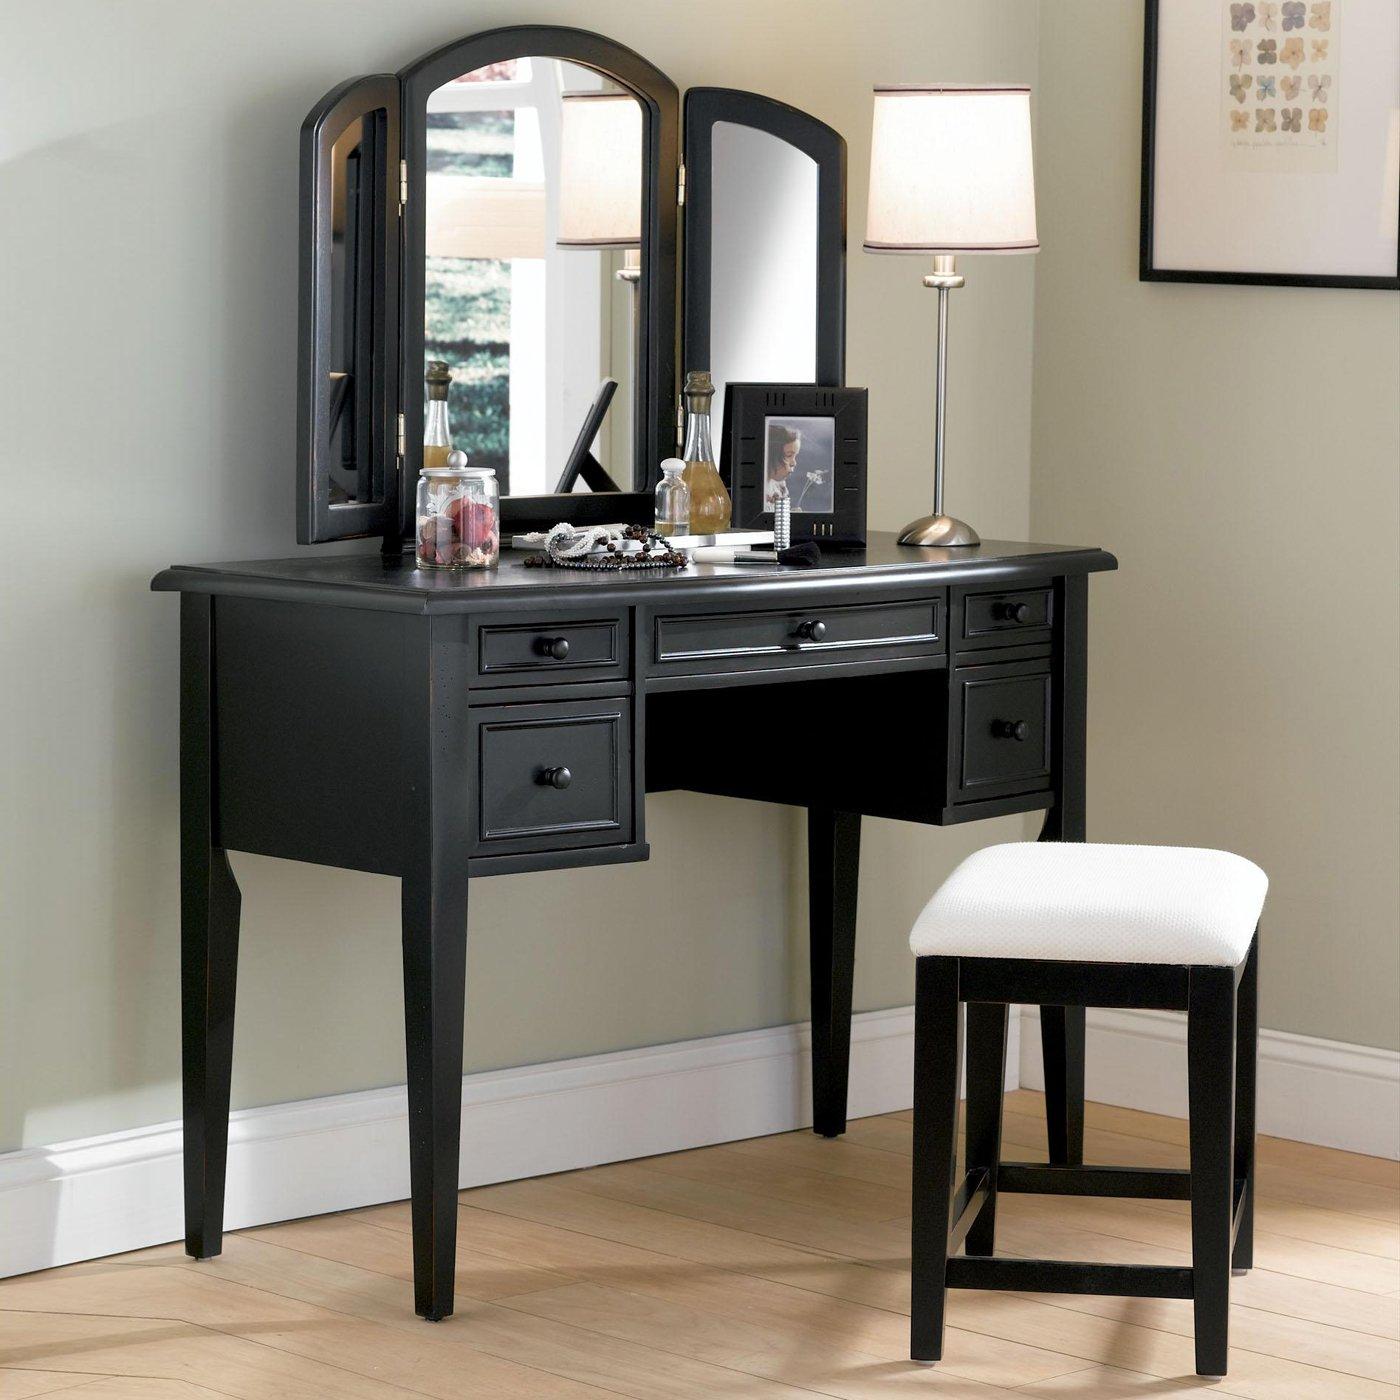 full size of bedroom:small vanity desk bedroom vanity with lights cheap BJHLNBW